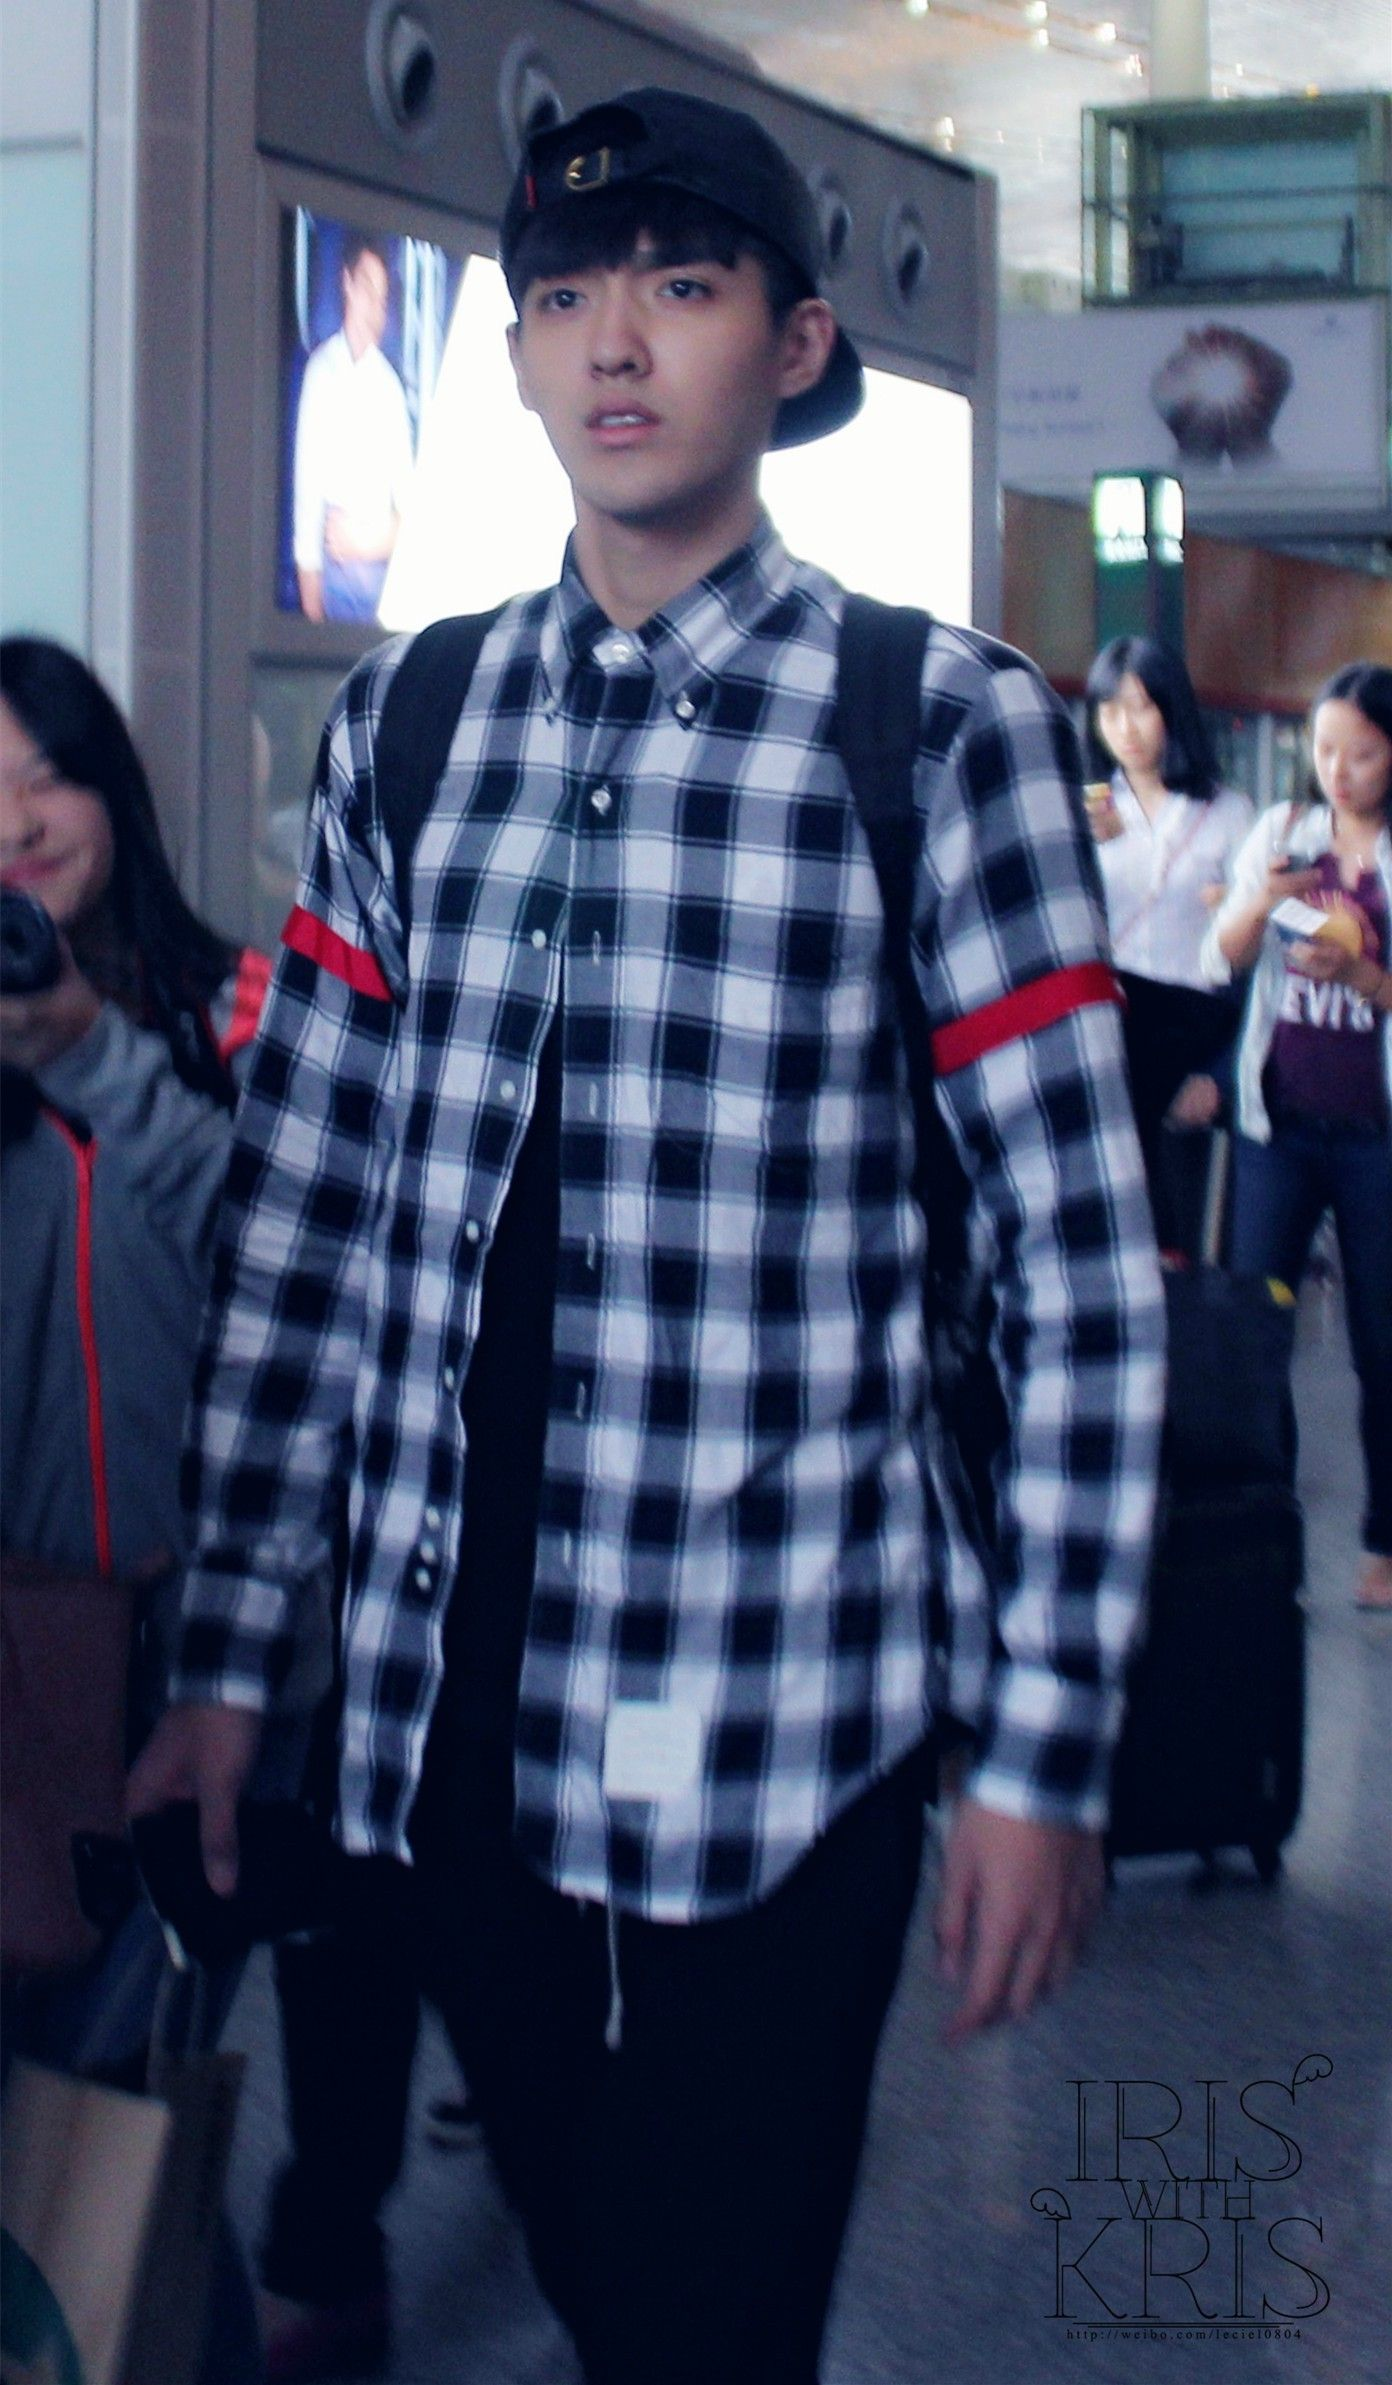 #Kris looks like #Chanyeol in this style